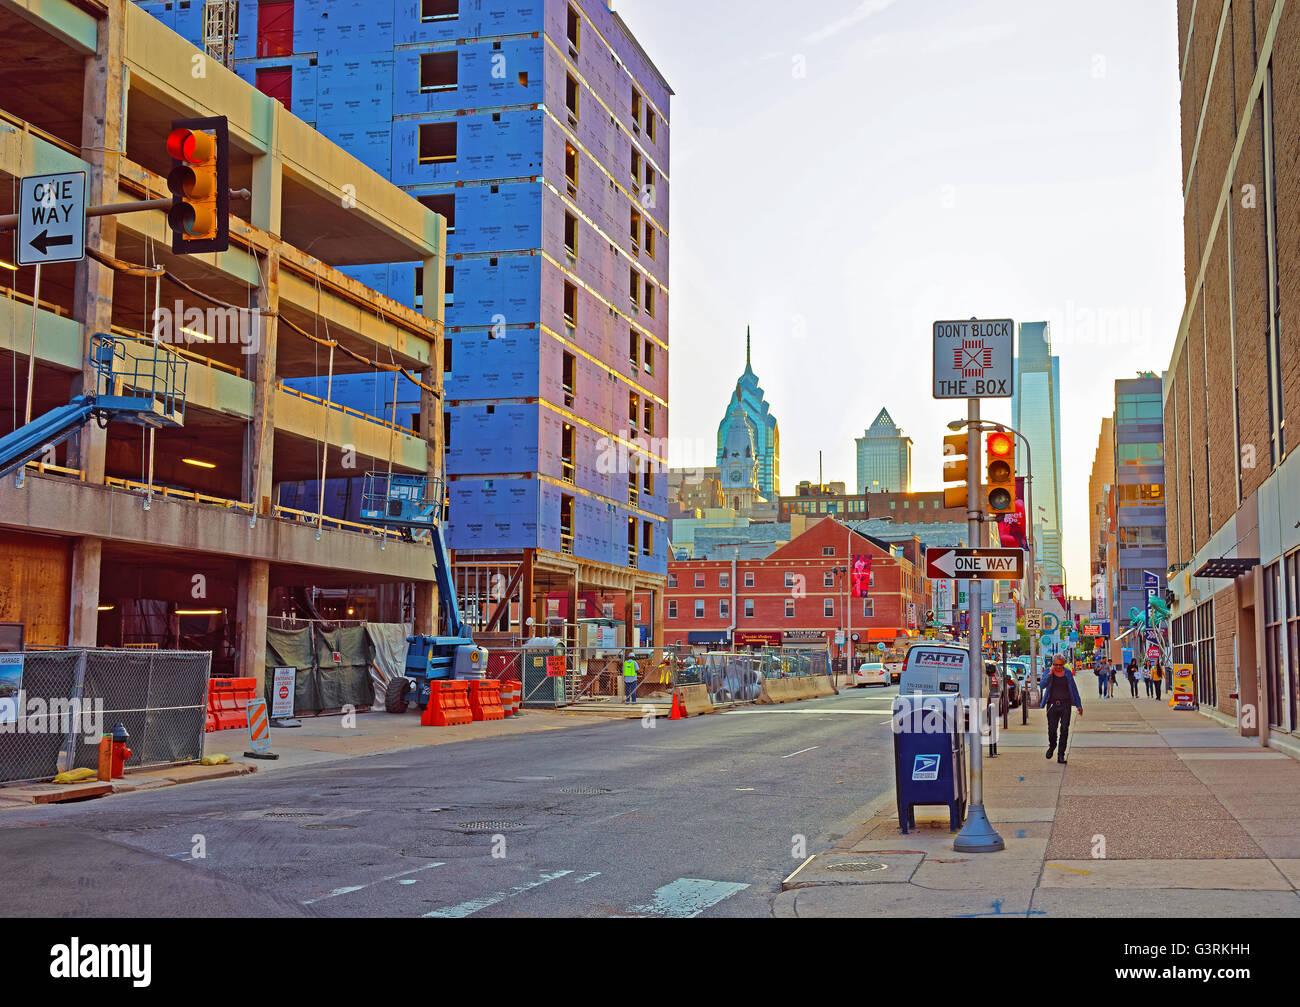 Philadelphia, USA - May 4, 2015: Sunset in the City Center of Philadelphia, Pennsylvania, USA. Tourists in the street. Stock Photo